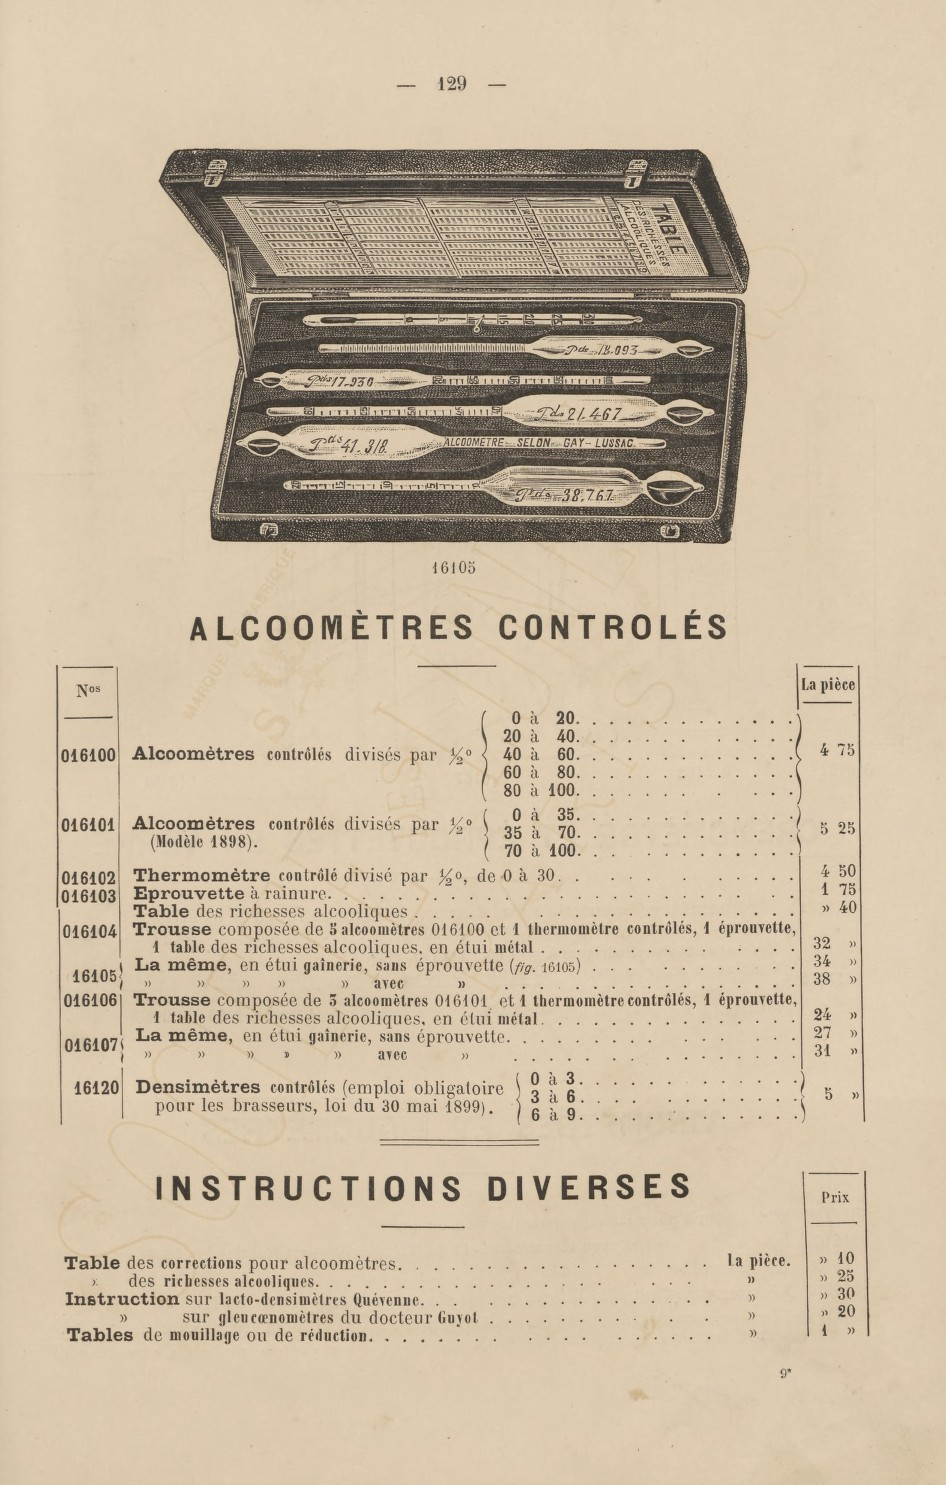 Cataloguelunetterieoptique_jp2.zip&file=cataloguelunetterieoptique_jp2%2fcataloguelunetterieoptique_0139